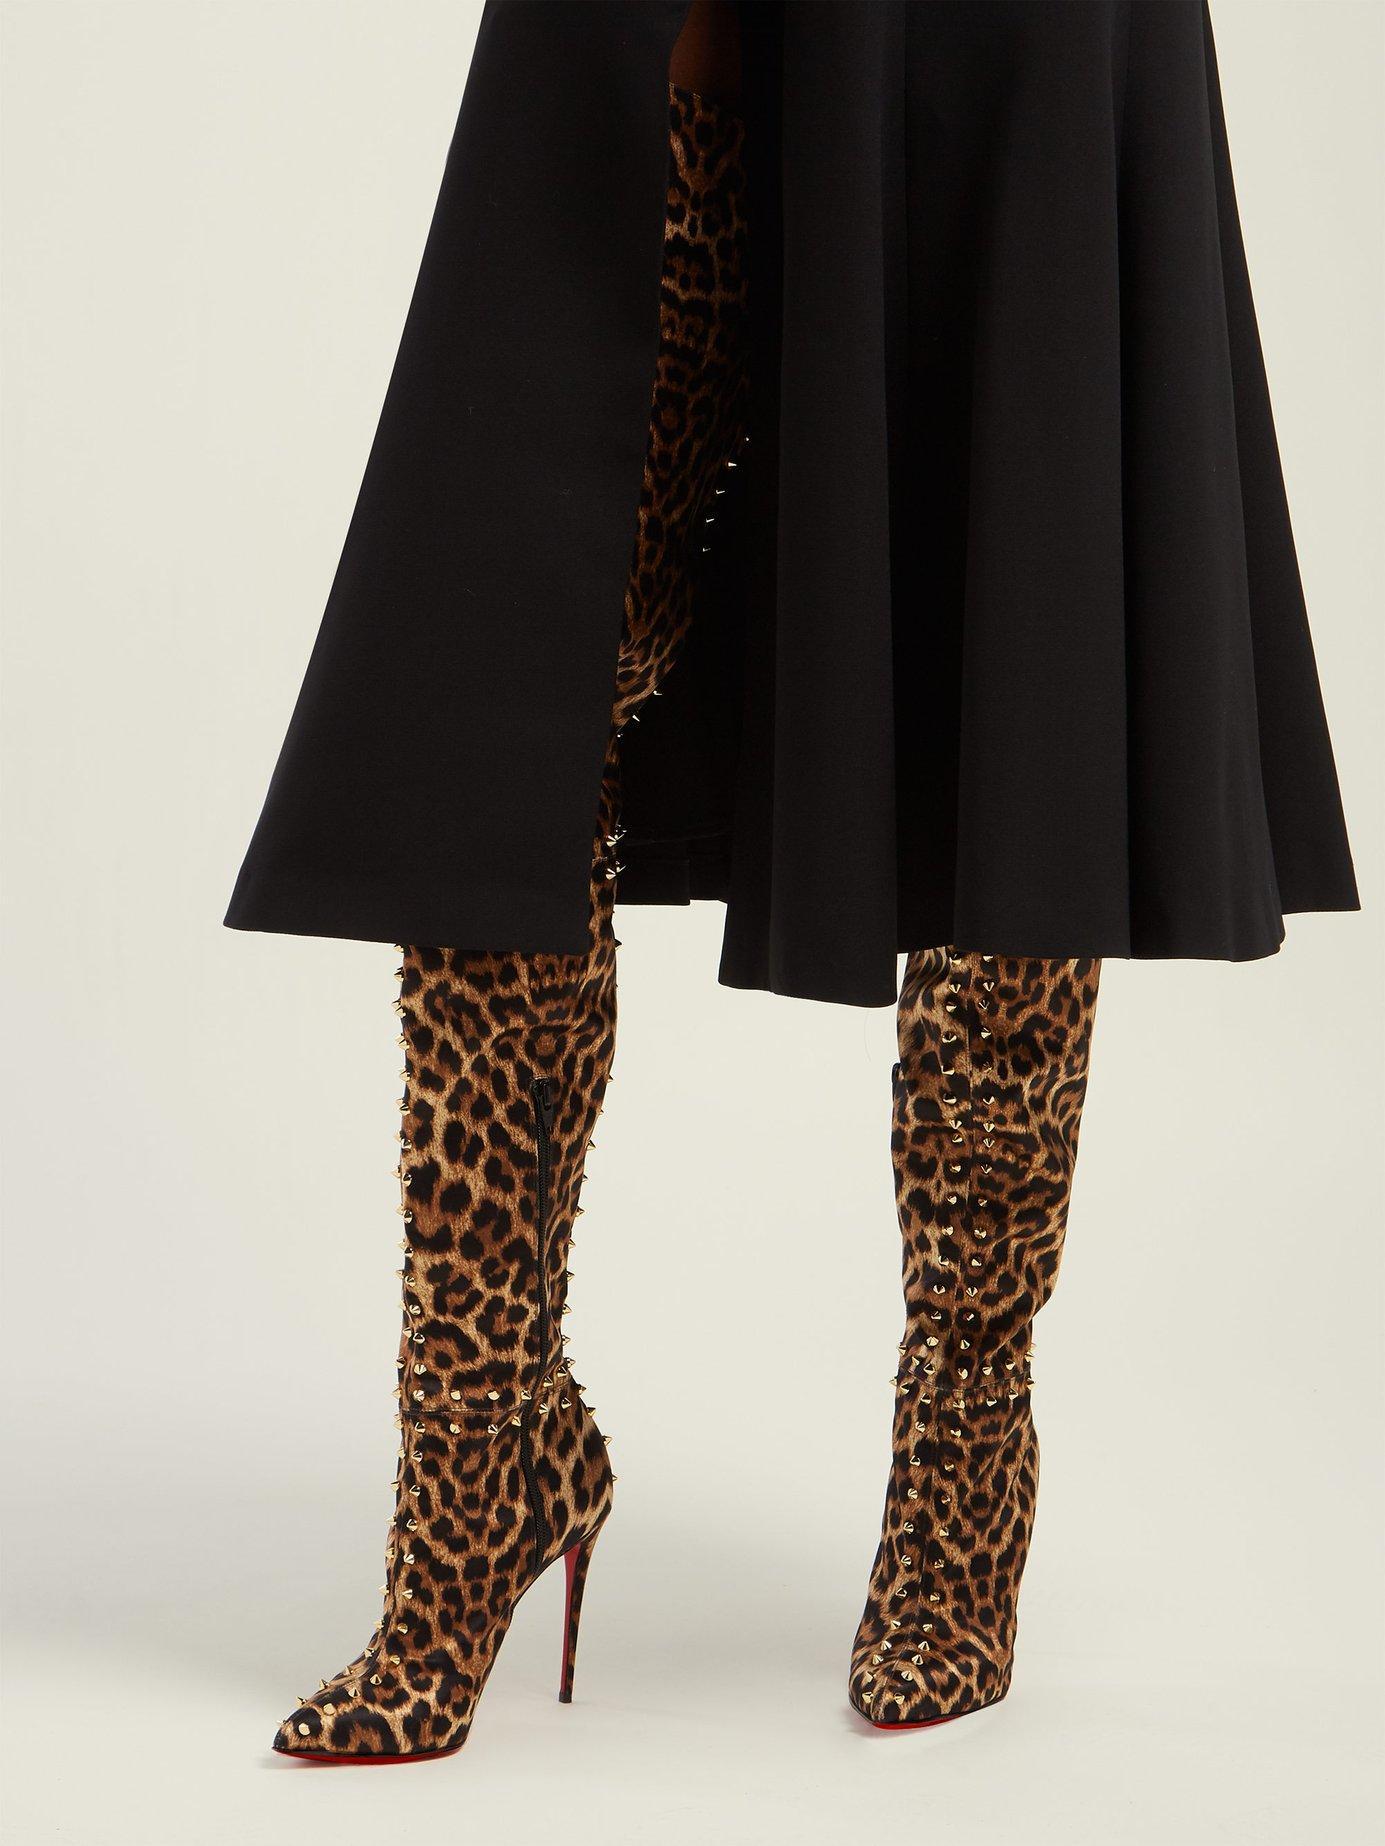 separation shoes 004d5 29791 Women's Brown Metrolisse 100 Leopard Print Over The Knee Boots